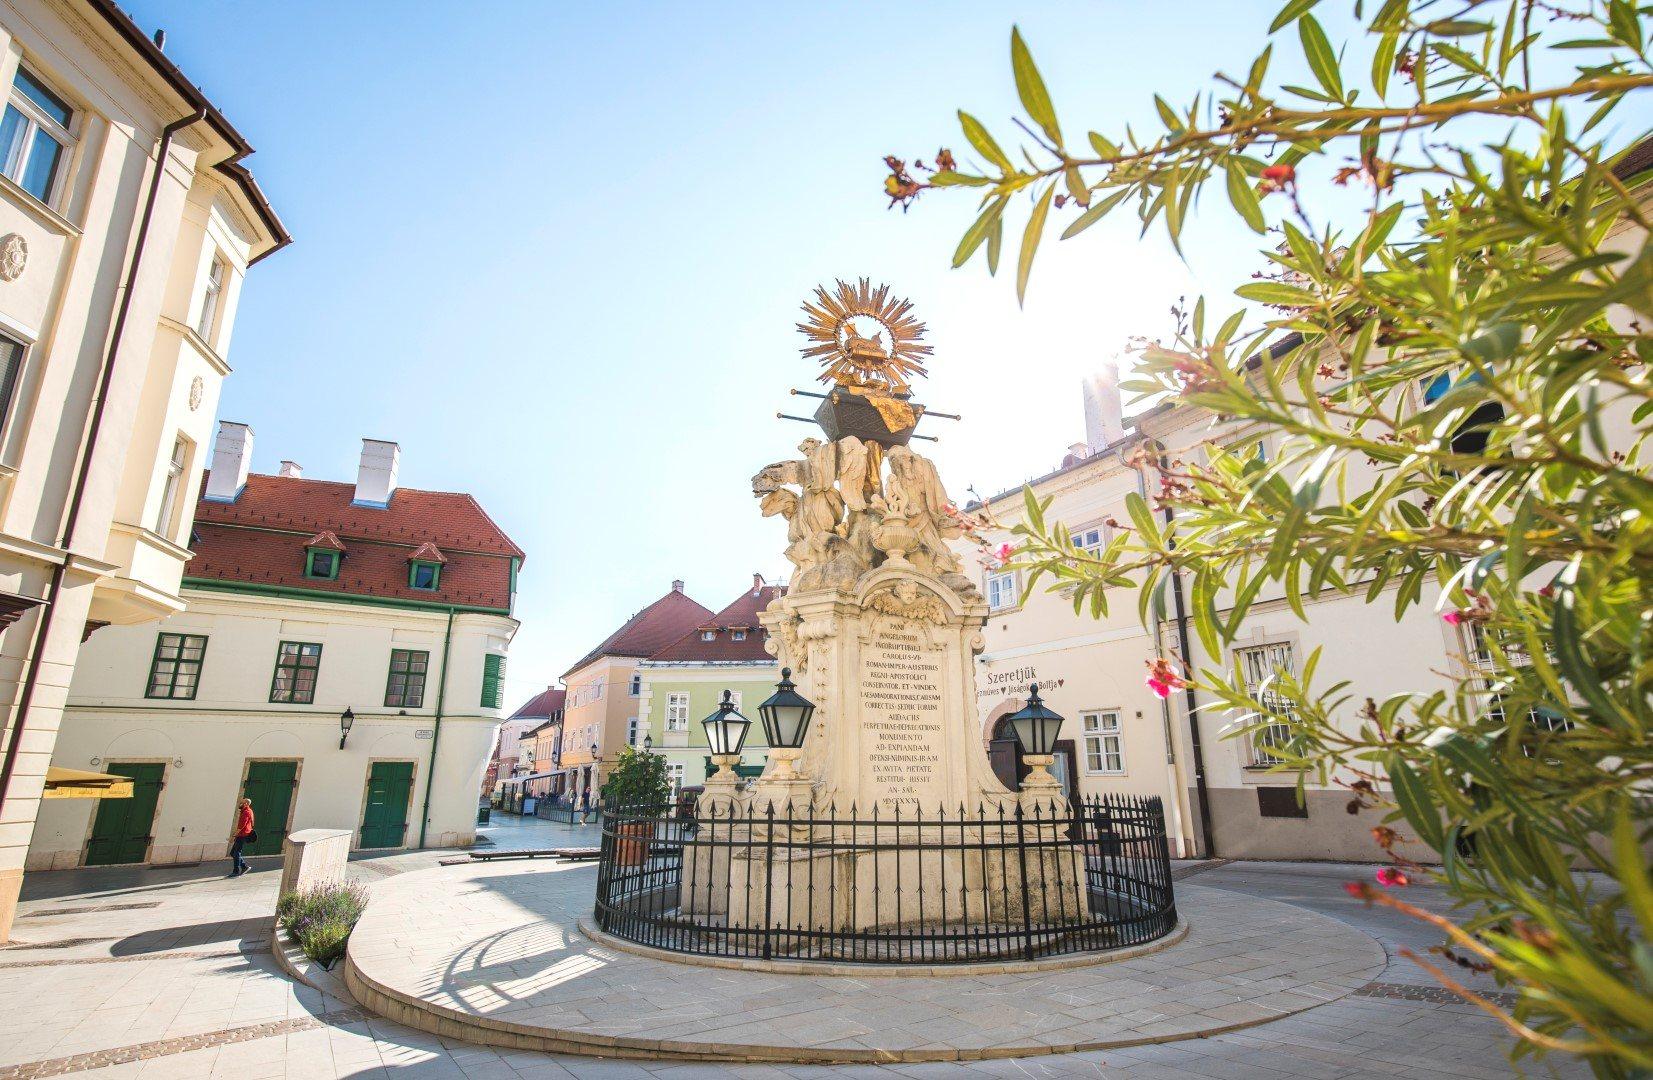 <a href='http://hellogyor.hu/de/sehenswurdigkeiten/gutenberg-platz/'>Gutenberg-Platz</a>